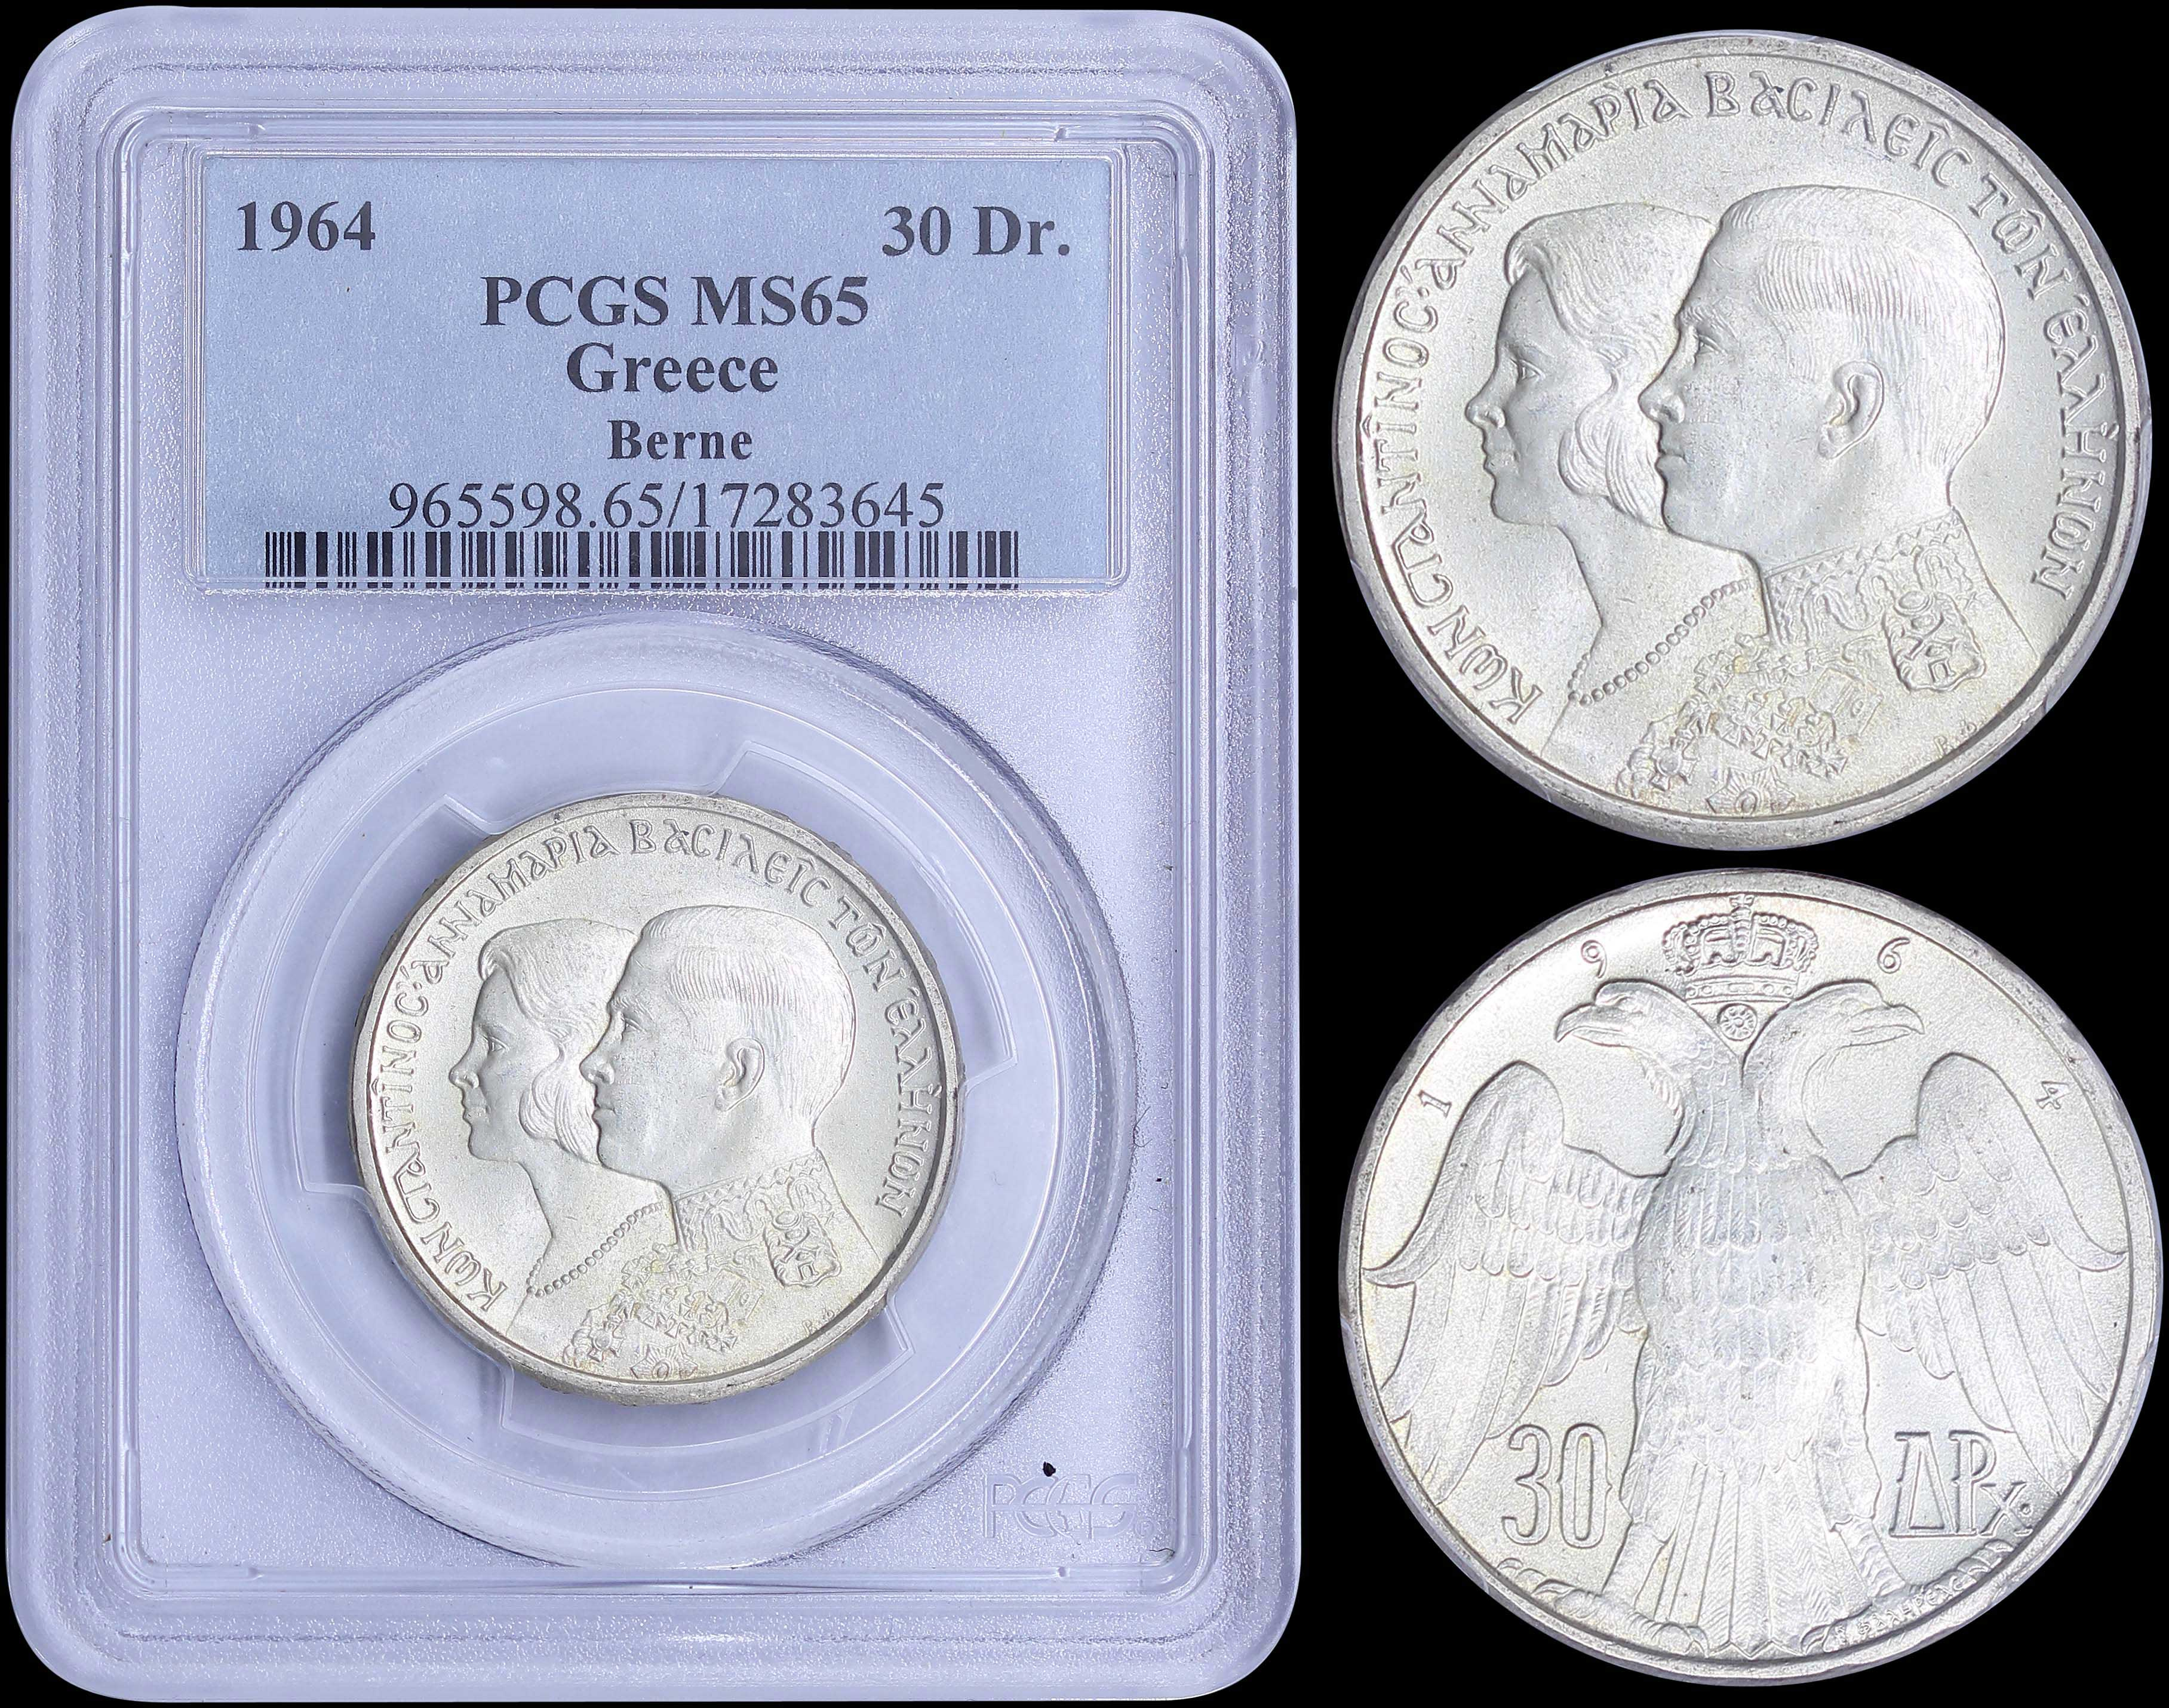 Lot 8200 - -  COINS & TOKENS king constantine ii -  A. Karamitsos Public & Live Bid Auction 644 Coins, Medals & Banknotes